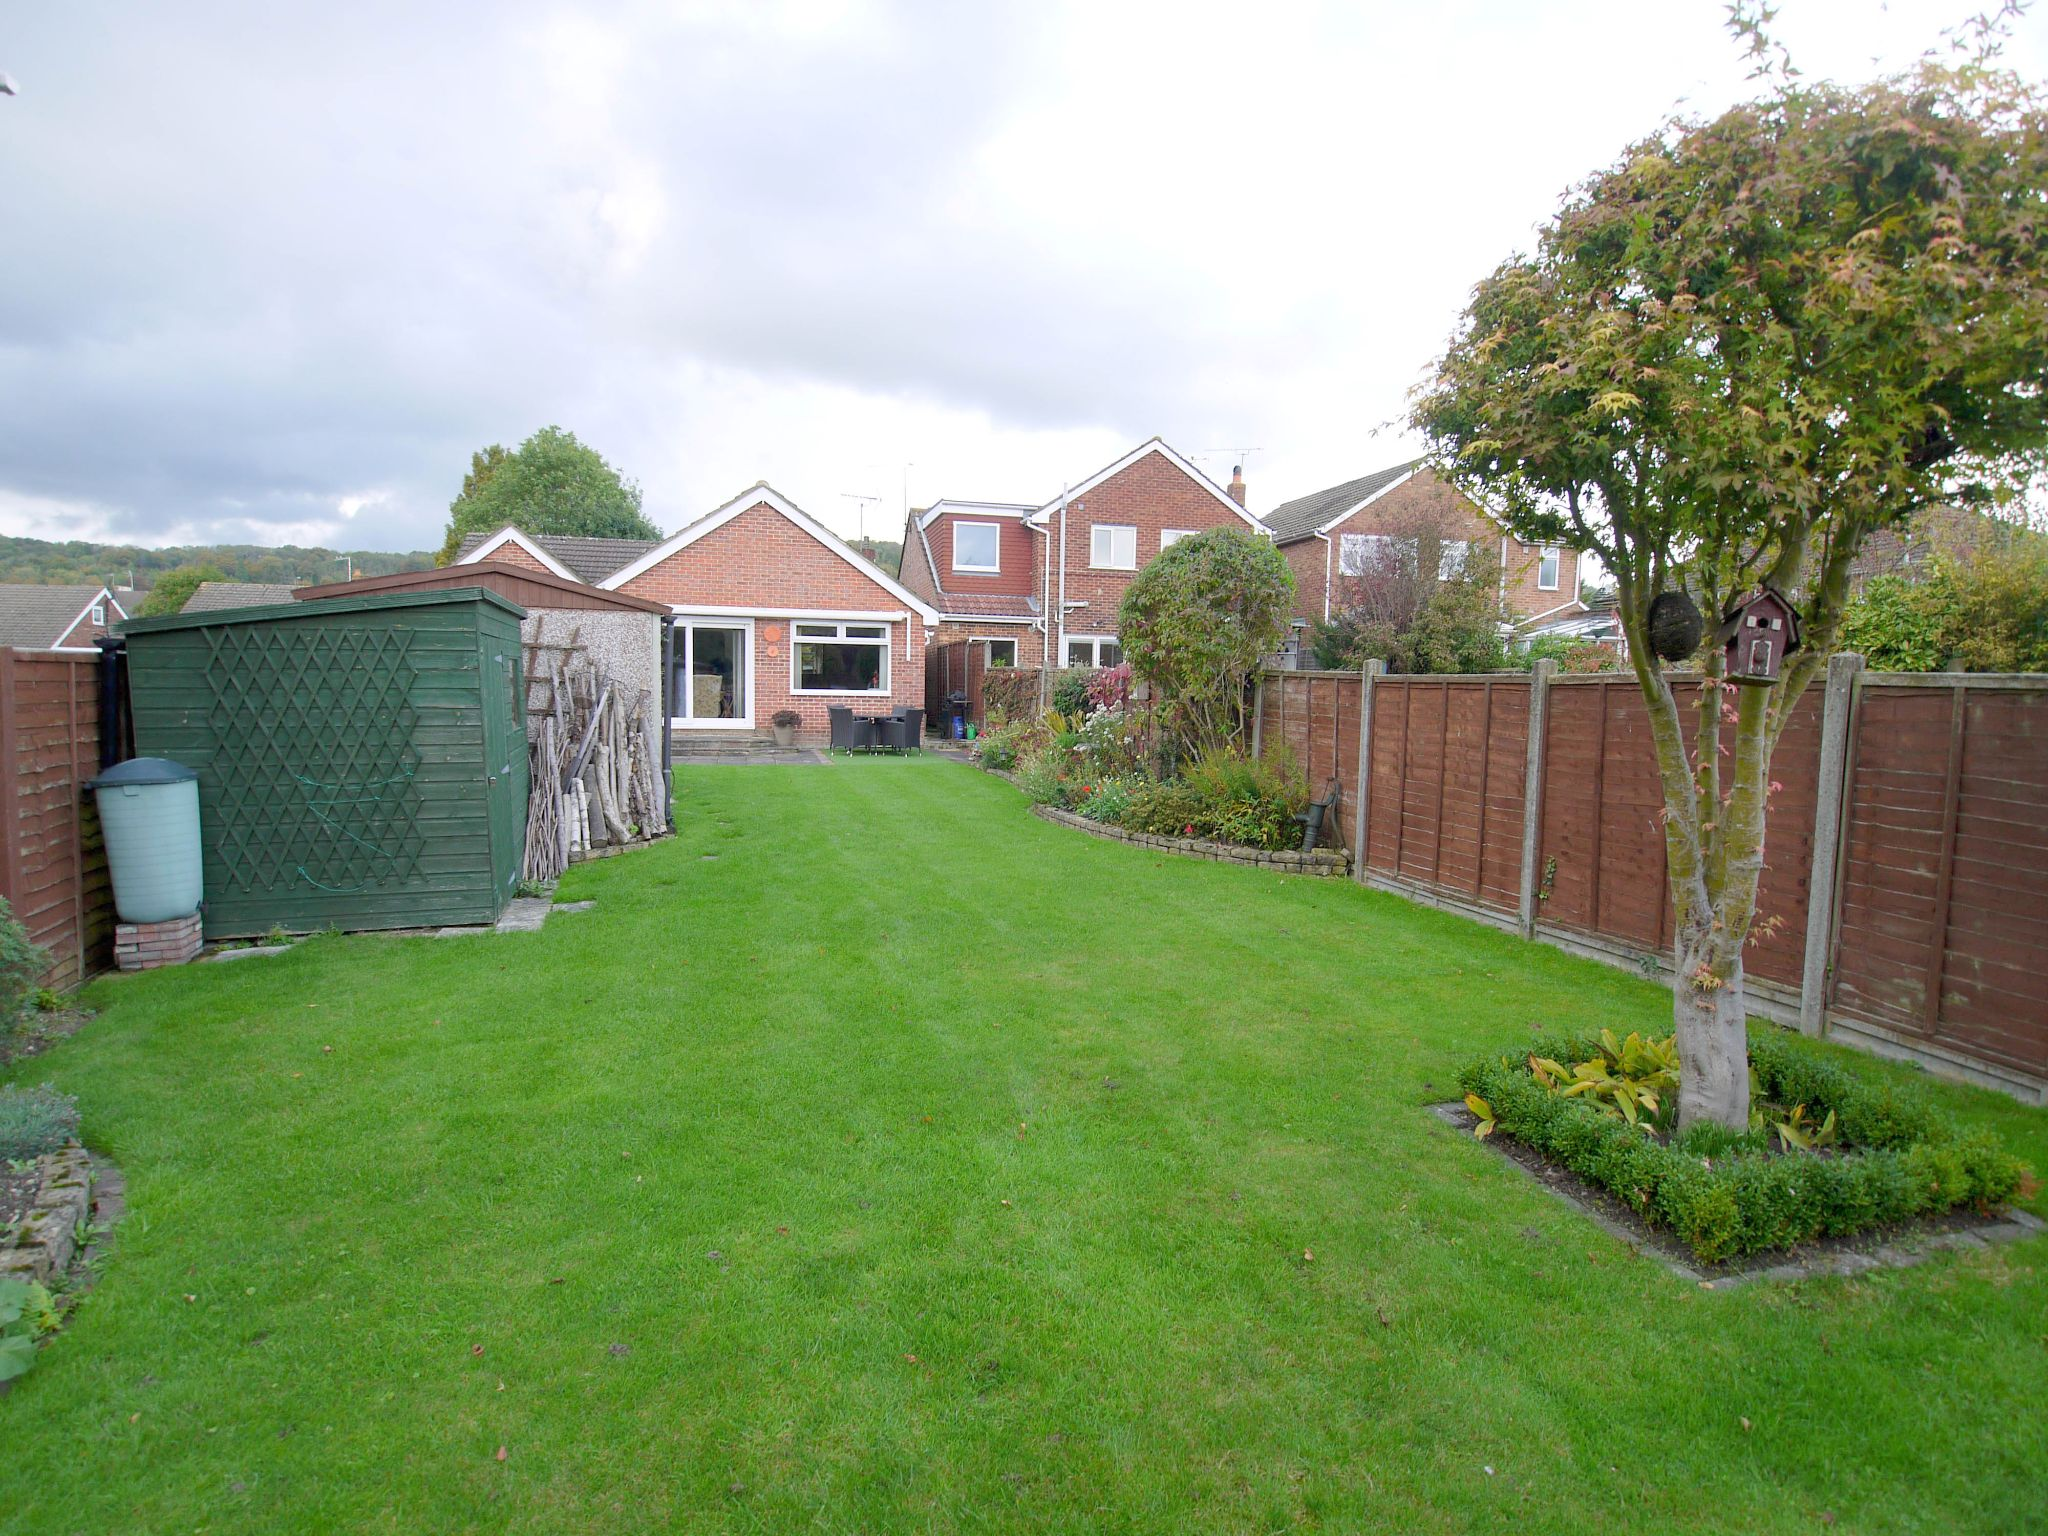 3 bedroom detached bungalow Sold in Sevenoaks - Photograph 2